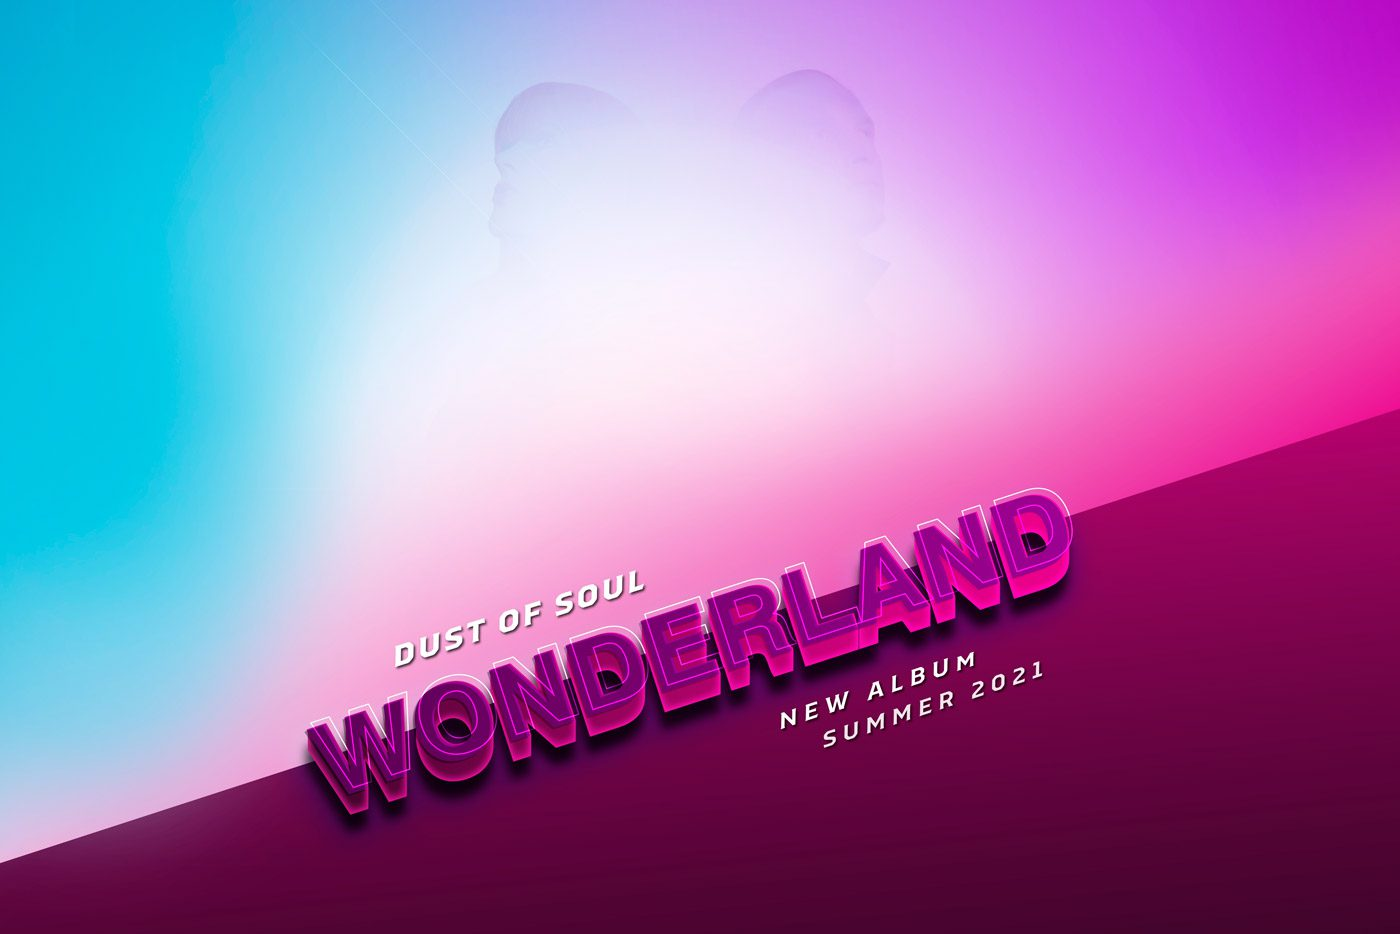 New Album «Wonderland» coming This Summer 2021